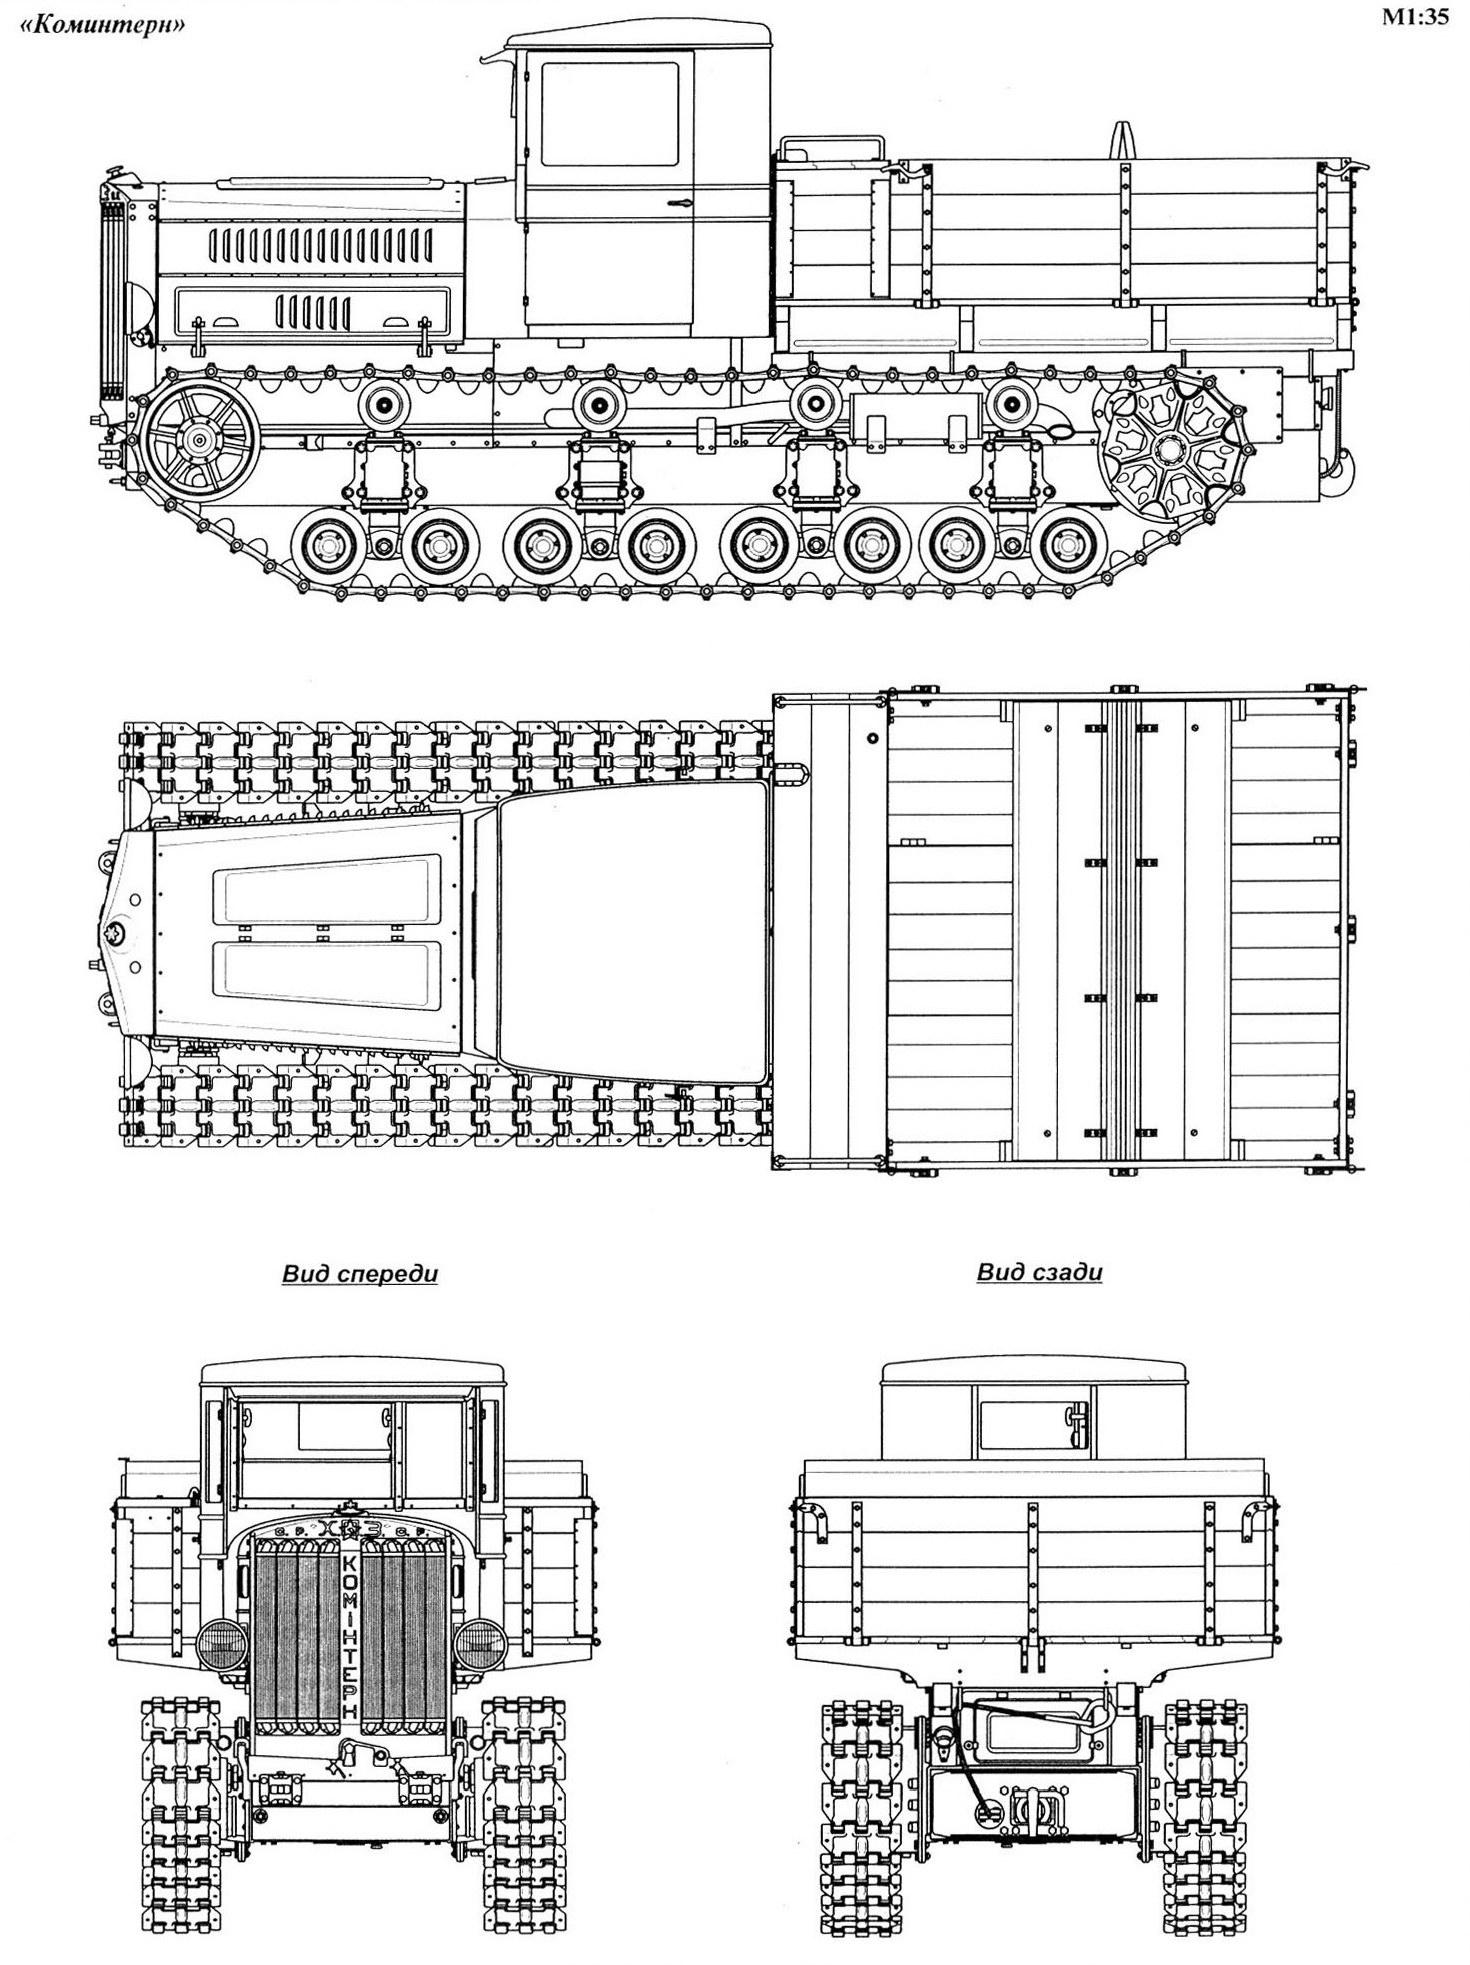 Komintern Artillery Tractor Blueprint